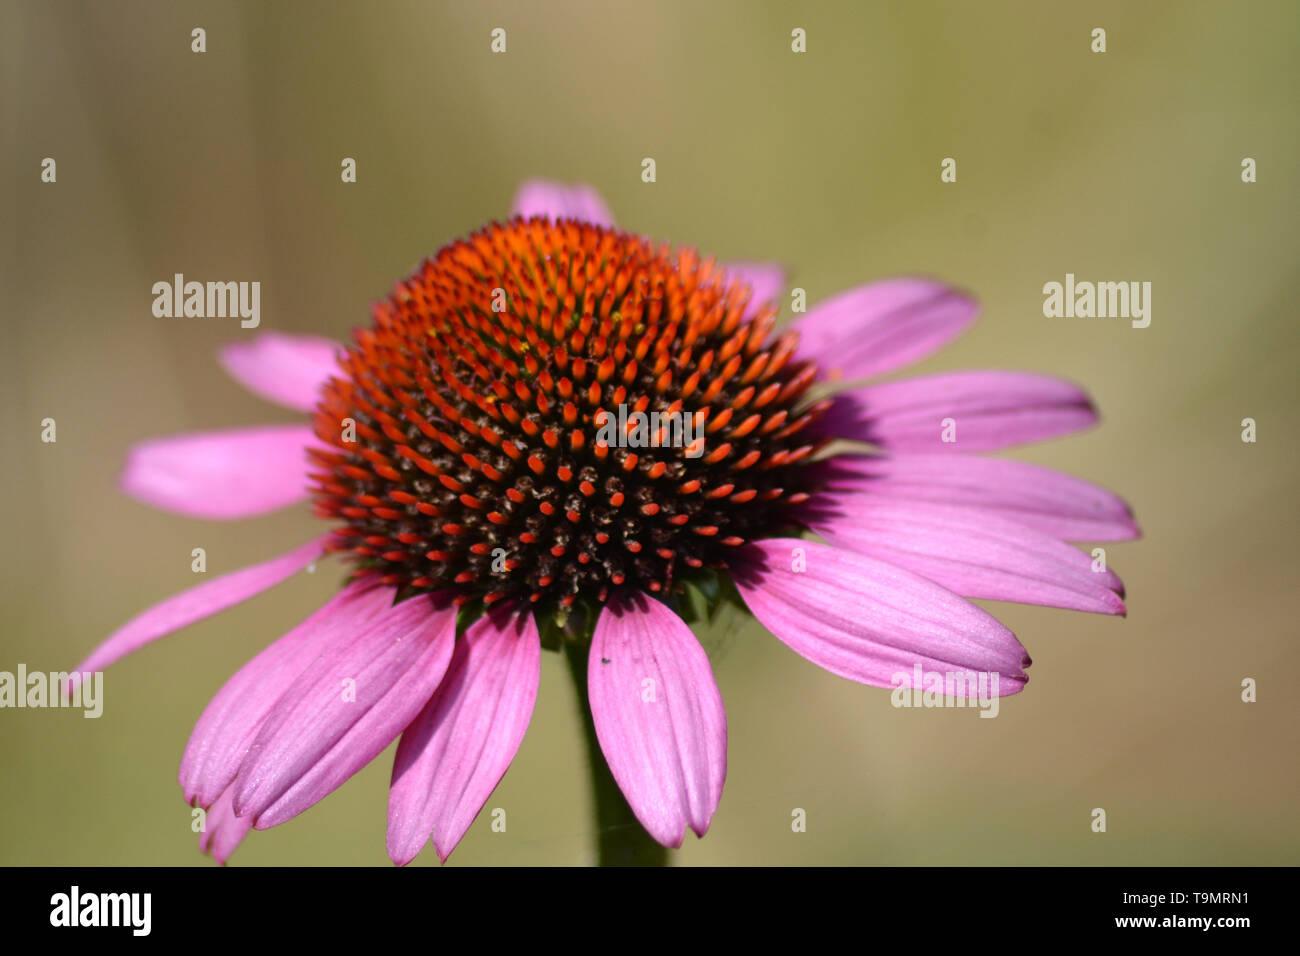 Echinacea purpurea {Purple coneflower} {Roter Sonnenhut} {Purpur-Sonnenhut} {Rudbeckia purpurea} - Stock Image